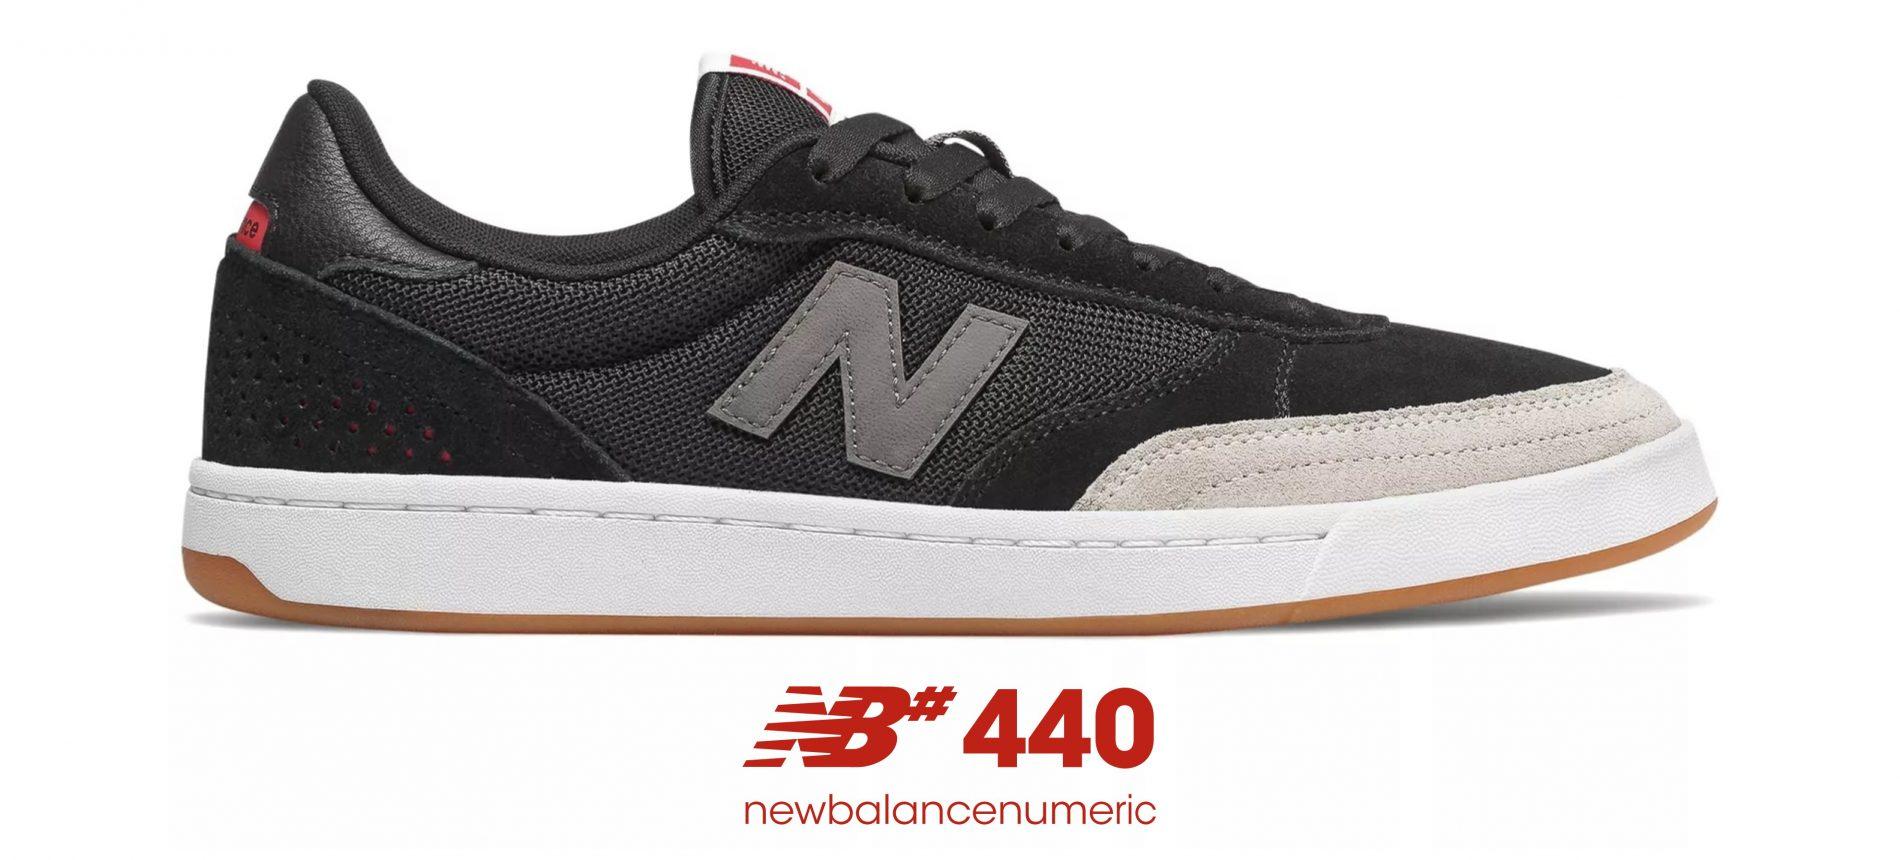 nb 440-01